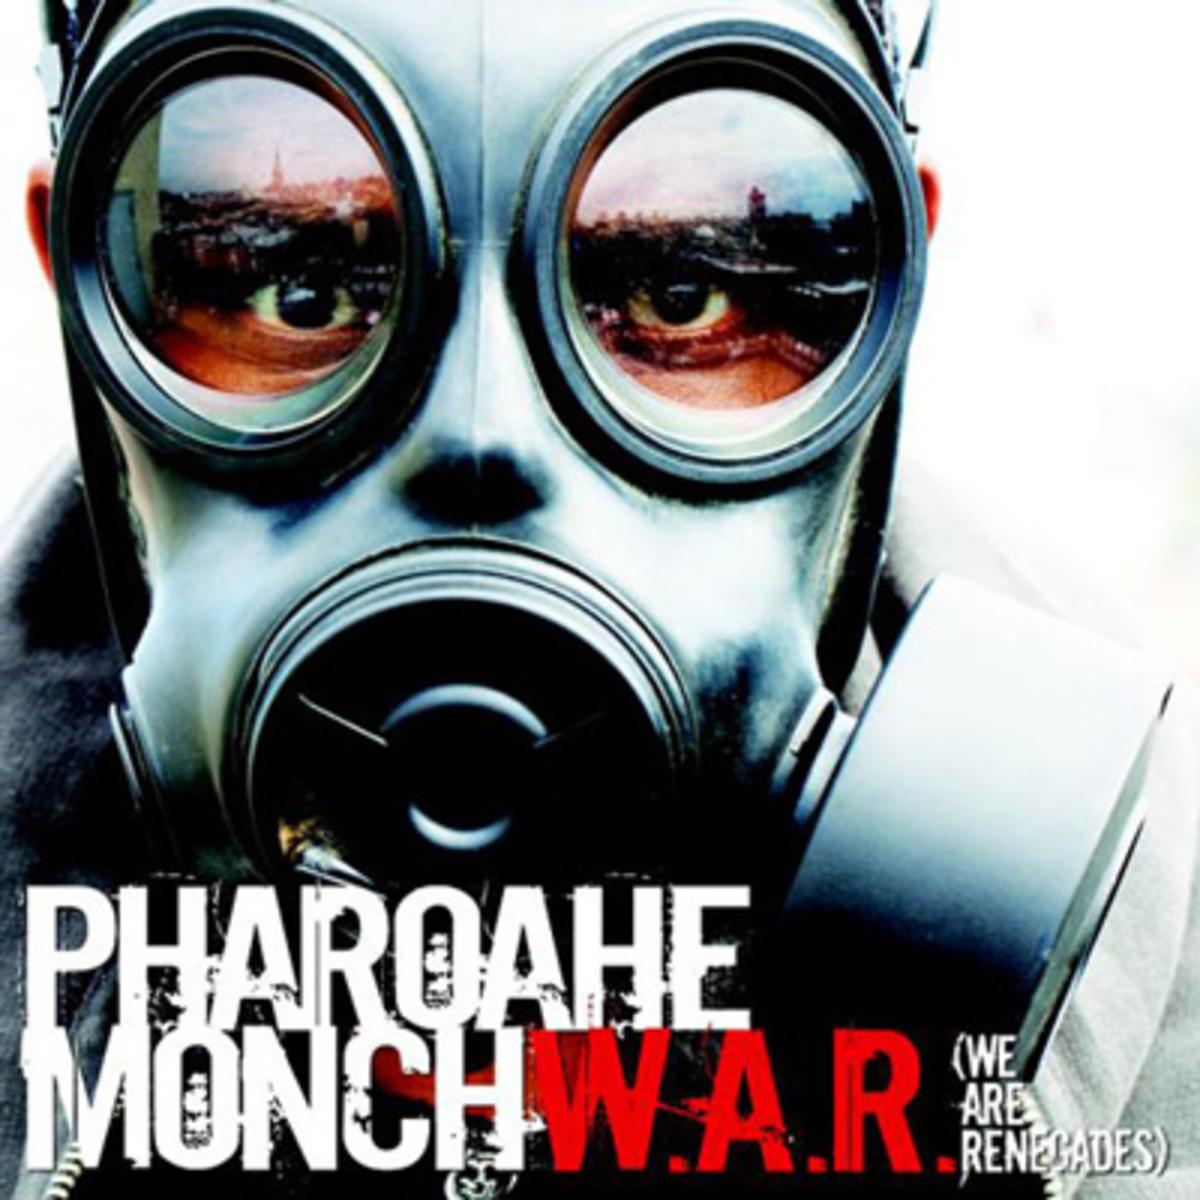 pharoahe-monch-war.jpg